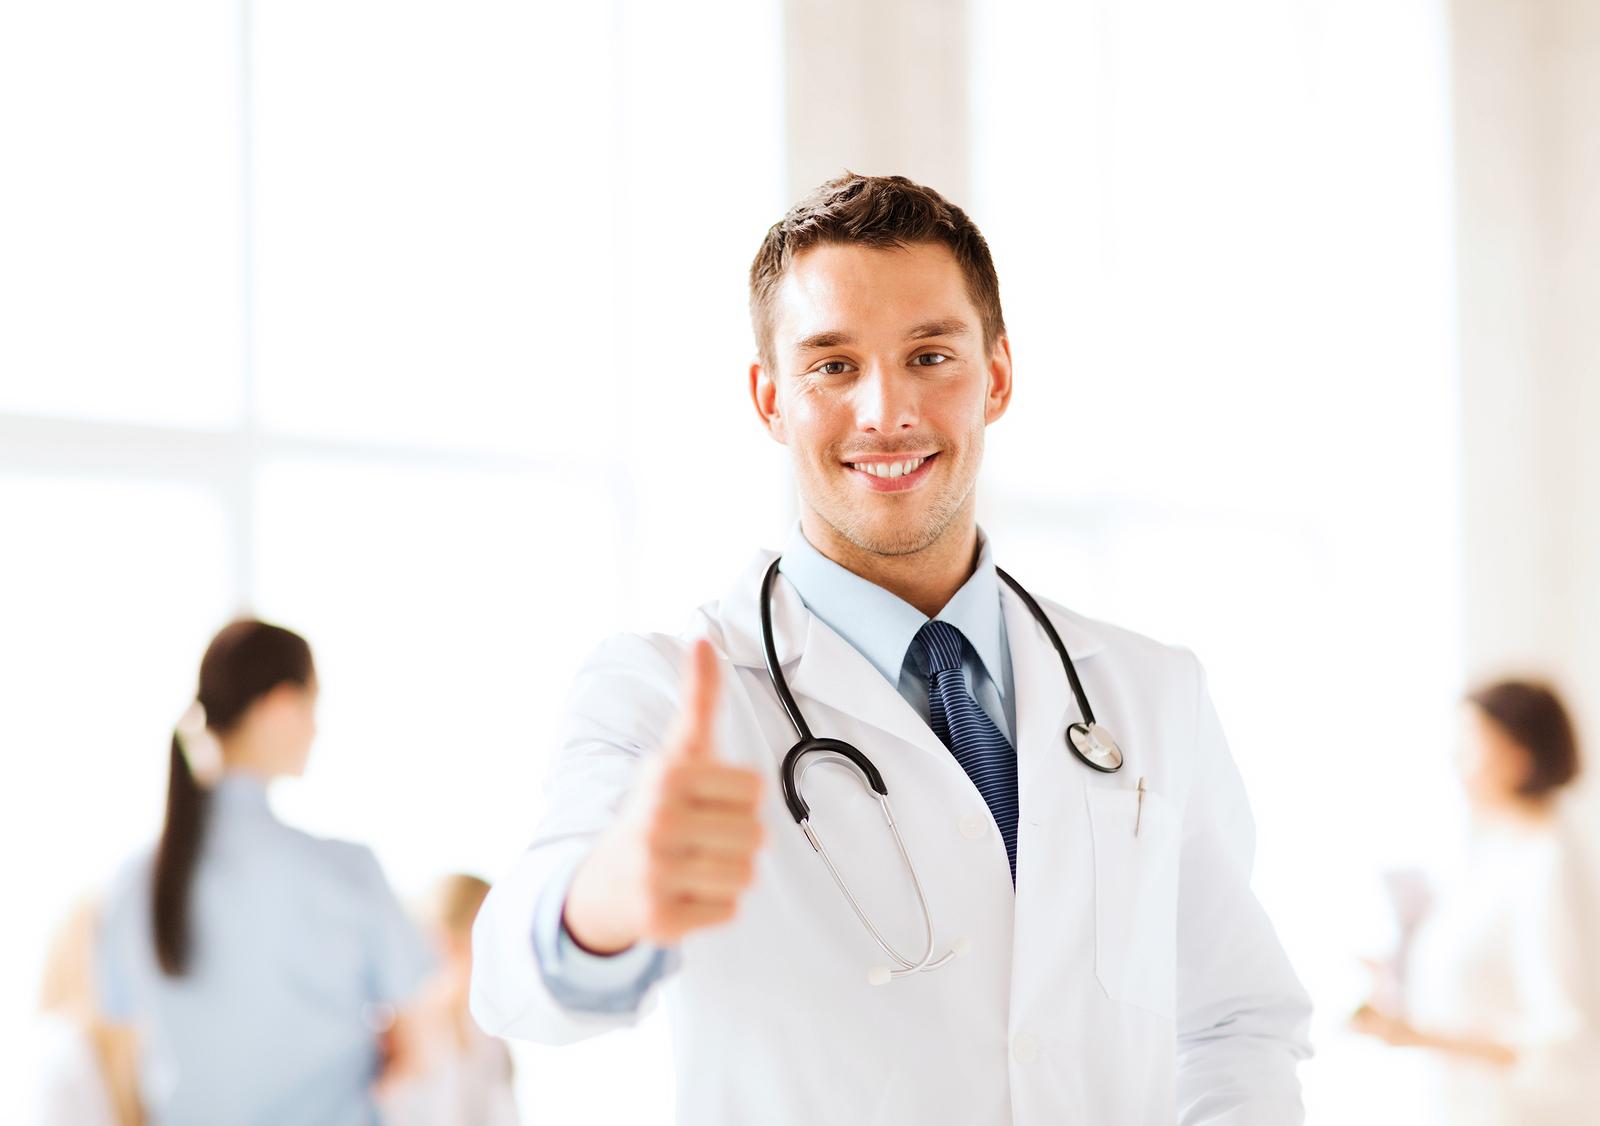 Plano de Saúde Medicol Saúde